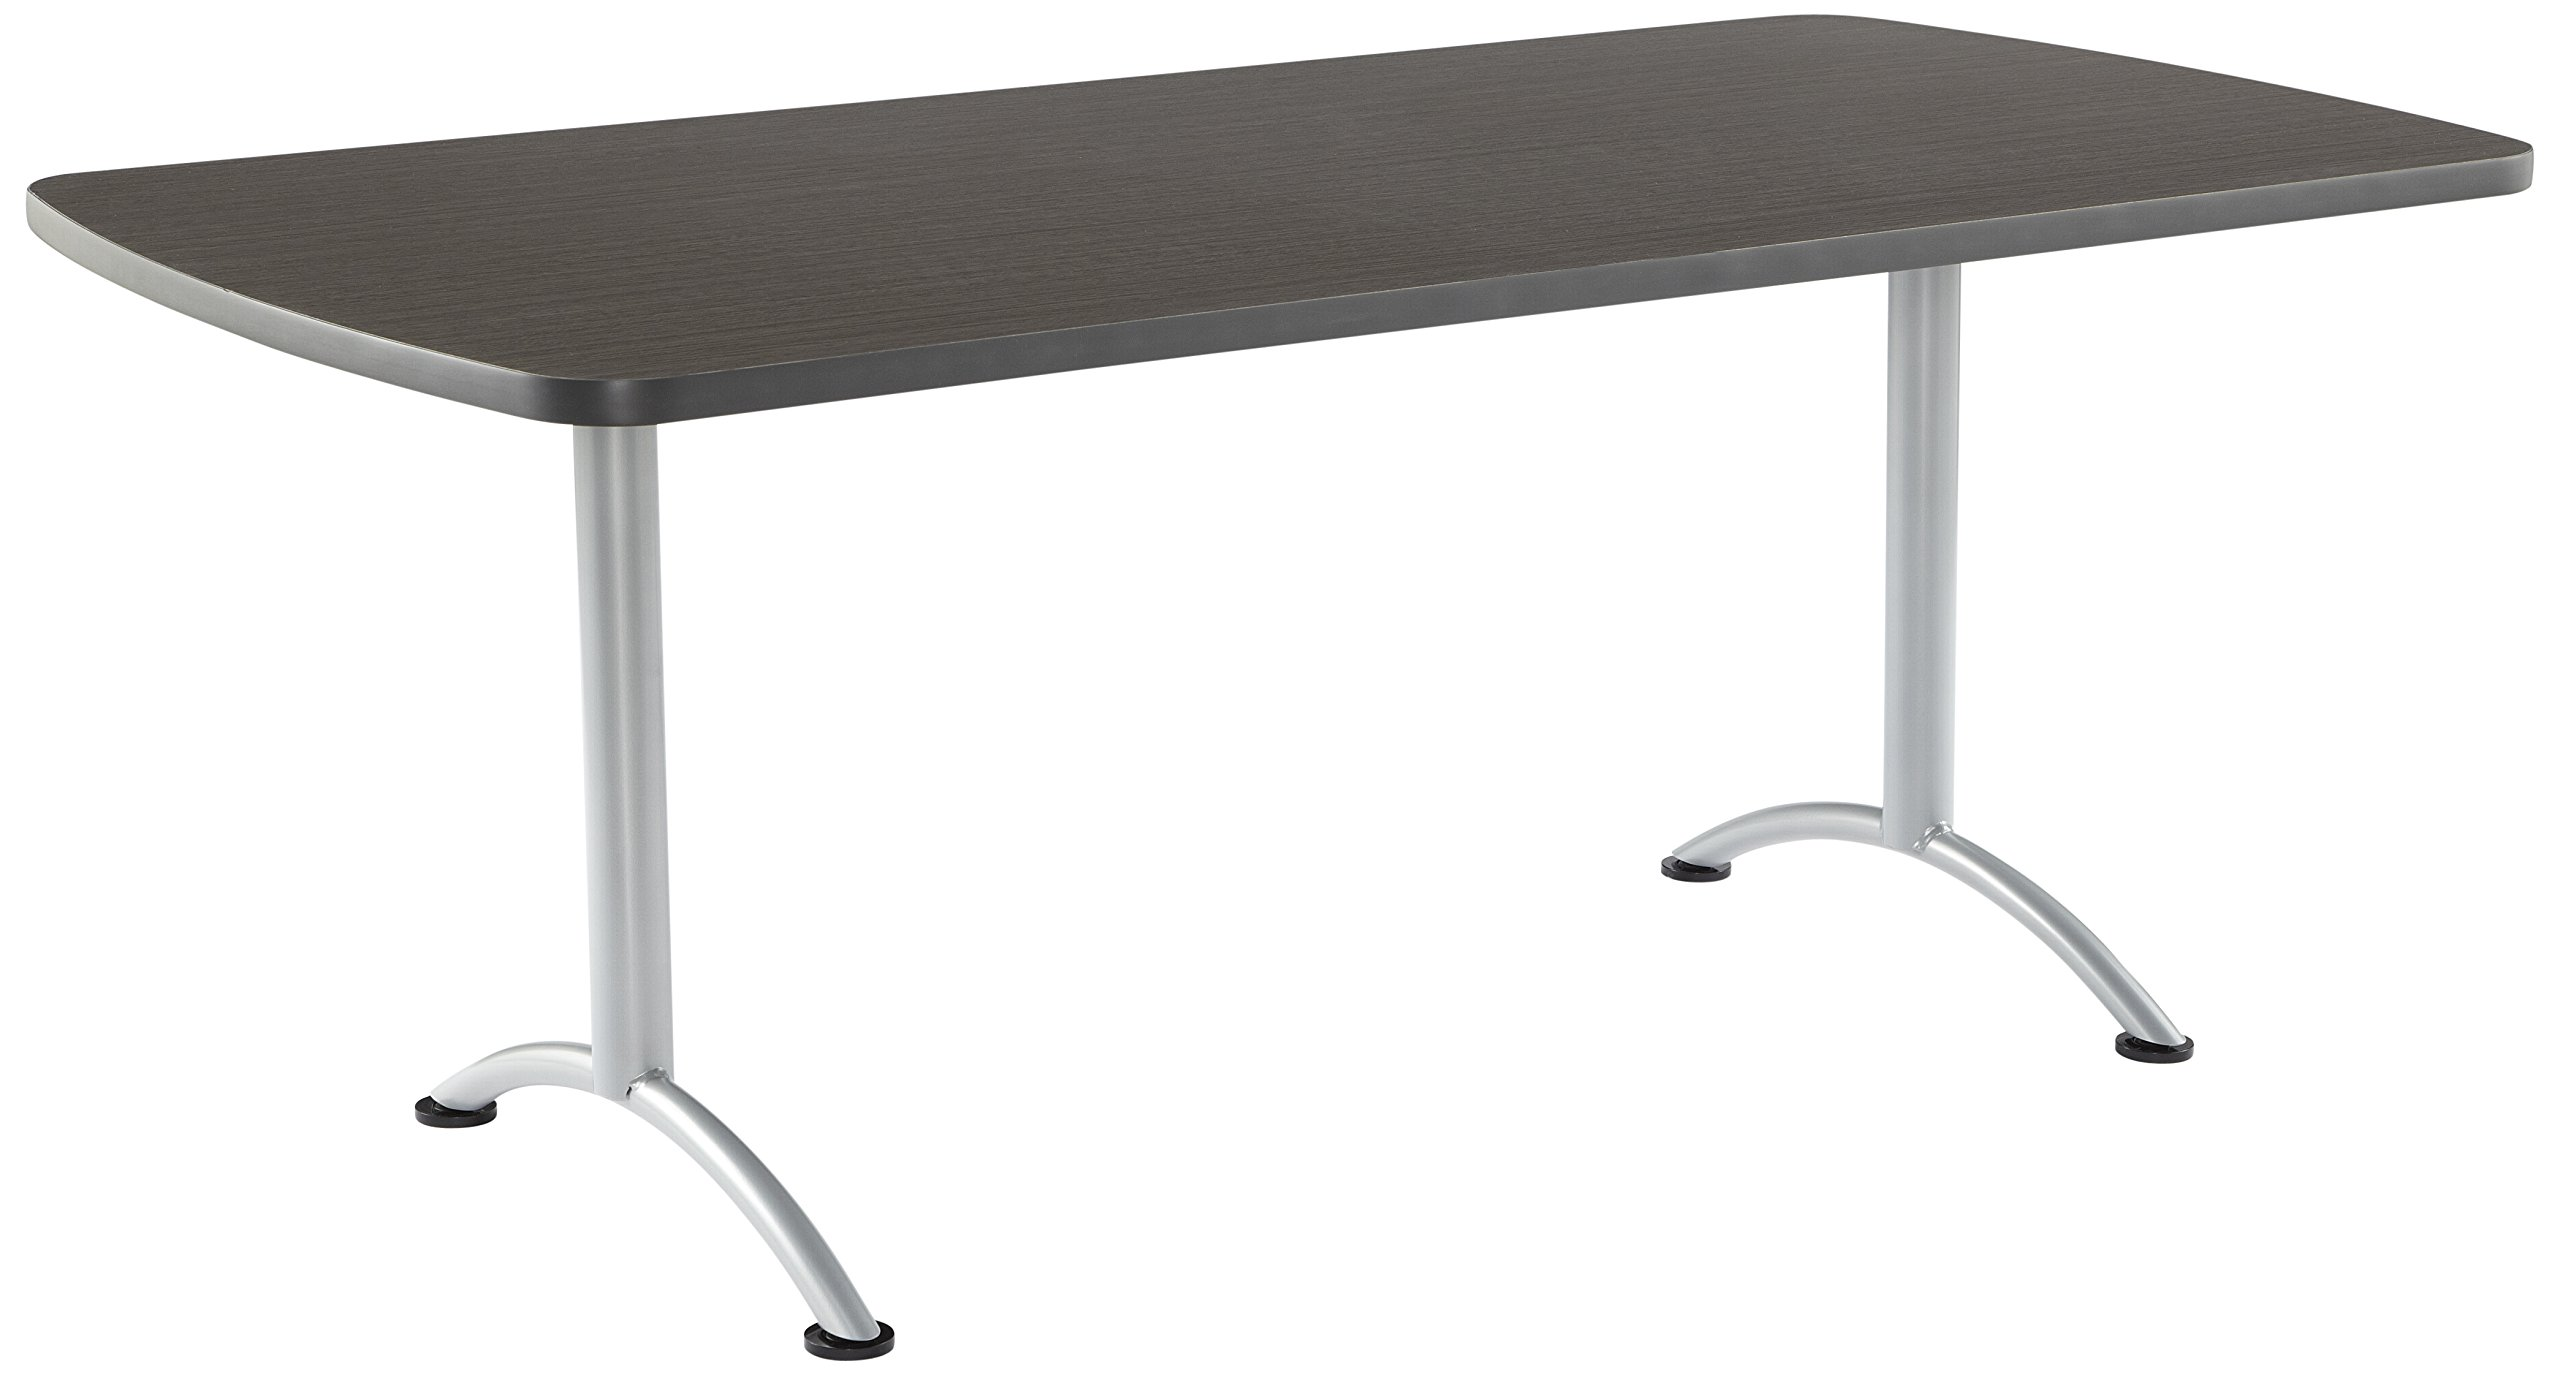 Iceberg ICE69225 ARC 6-foot Rectangular Conference Table, 36'' x 72'', Gray Walnut/Silver Leg